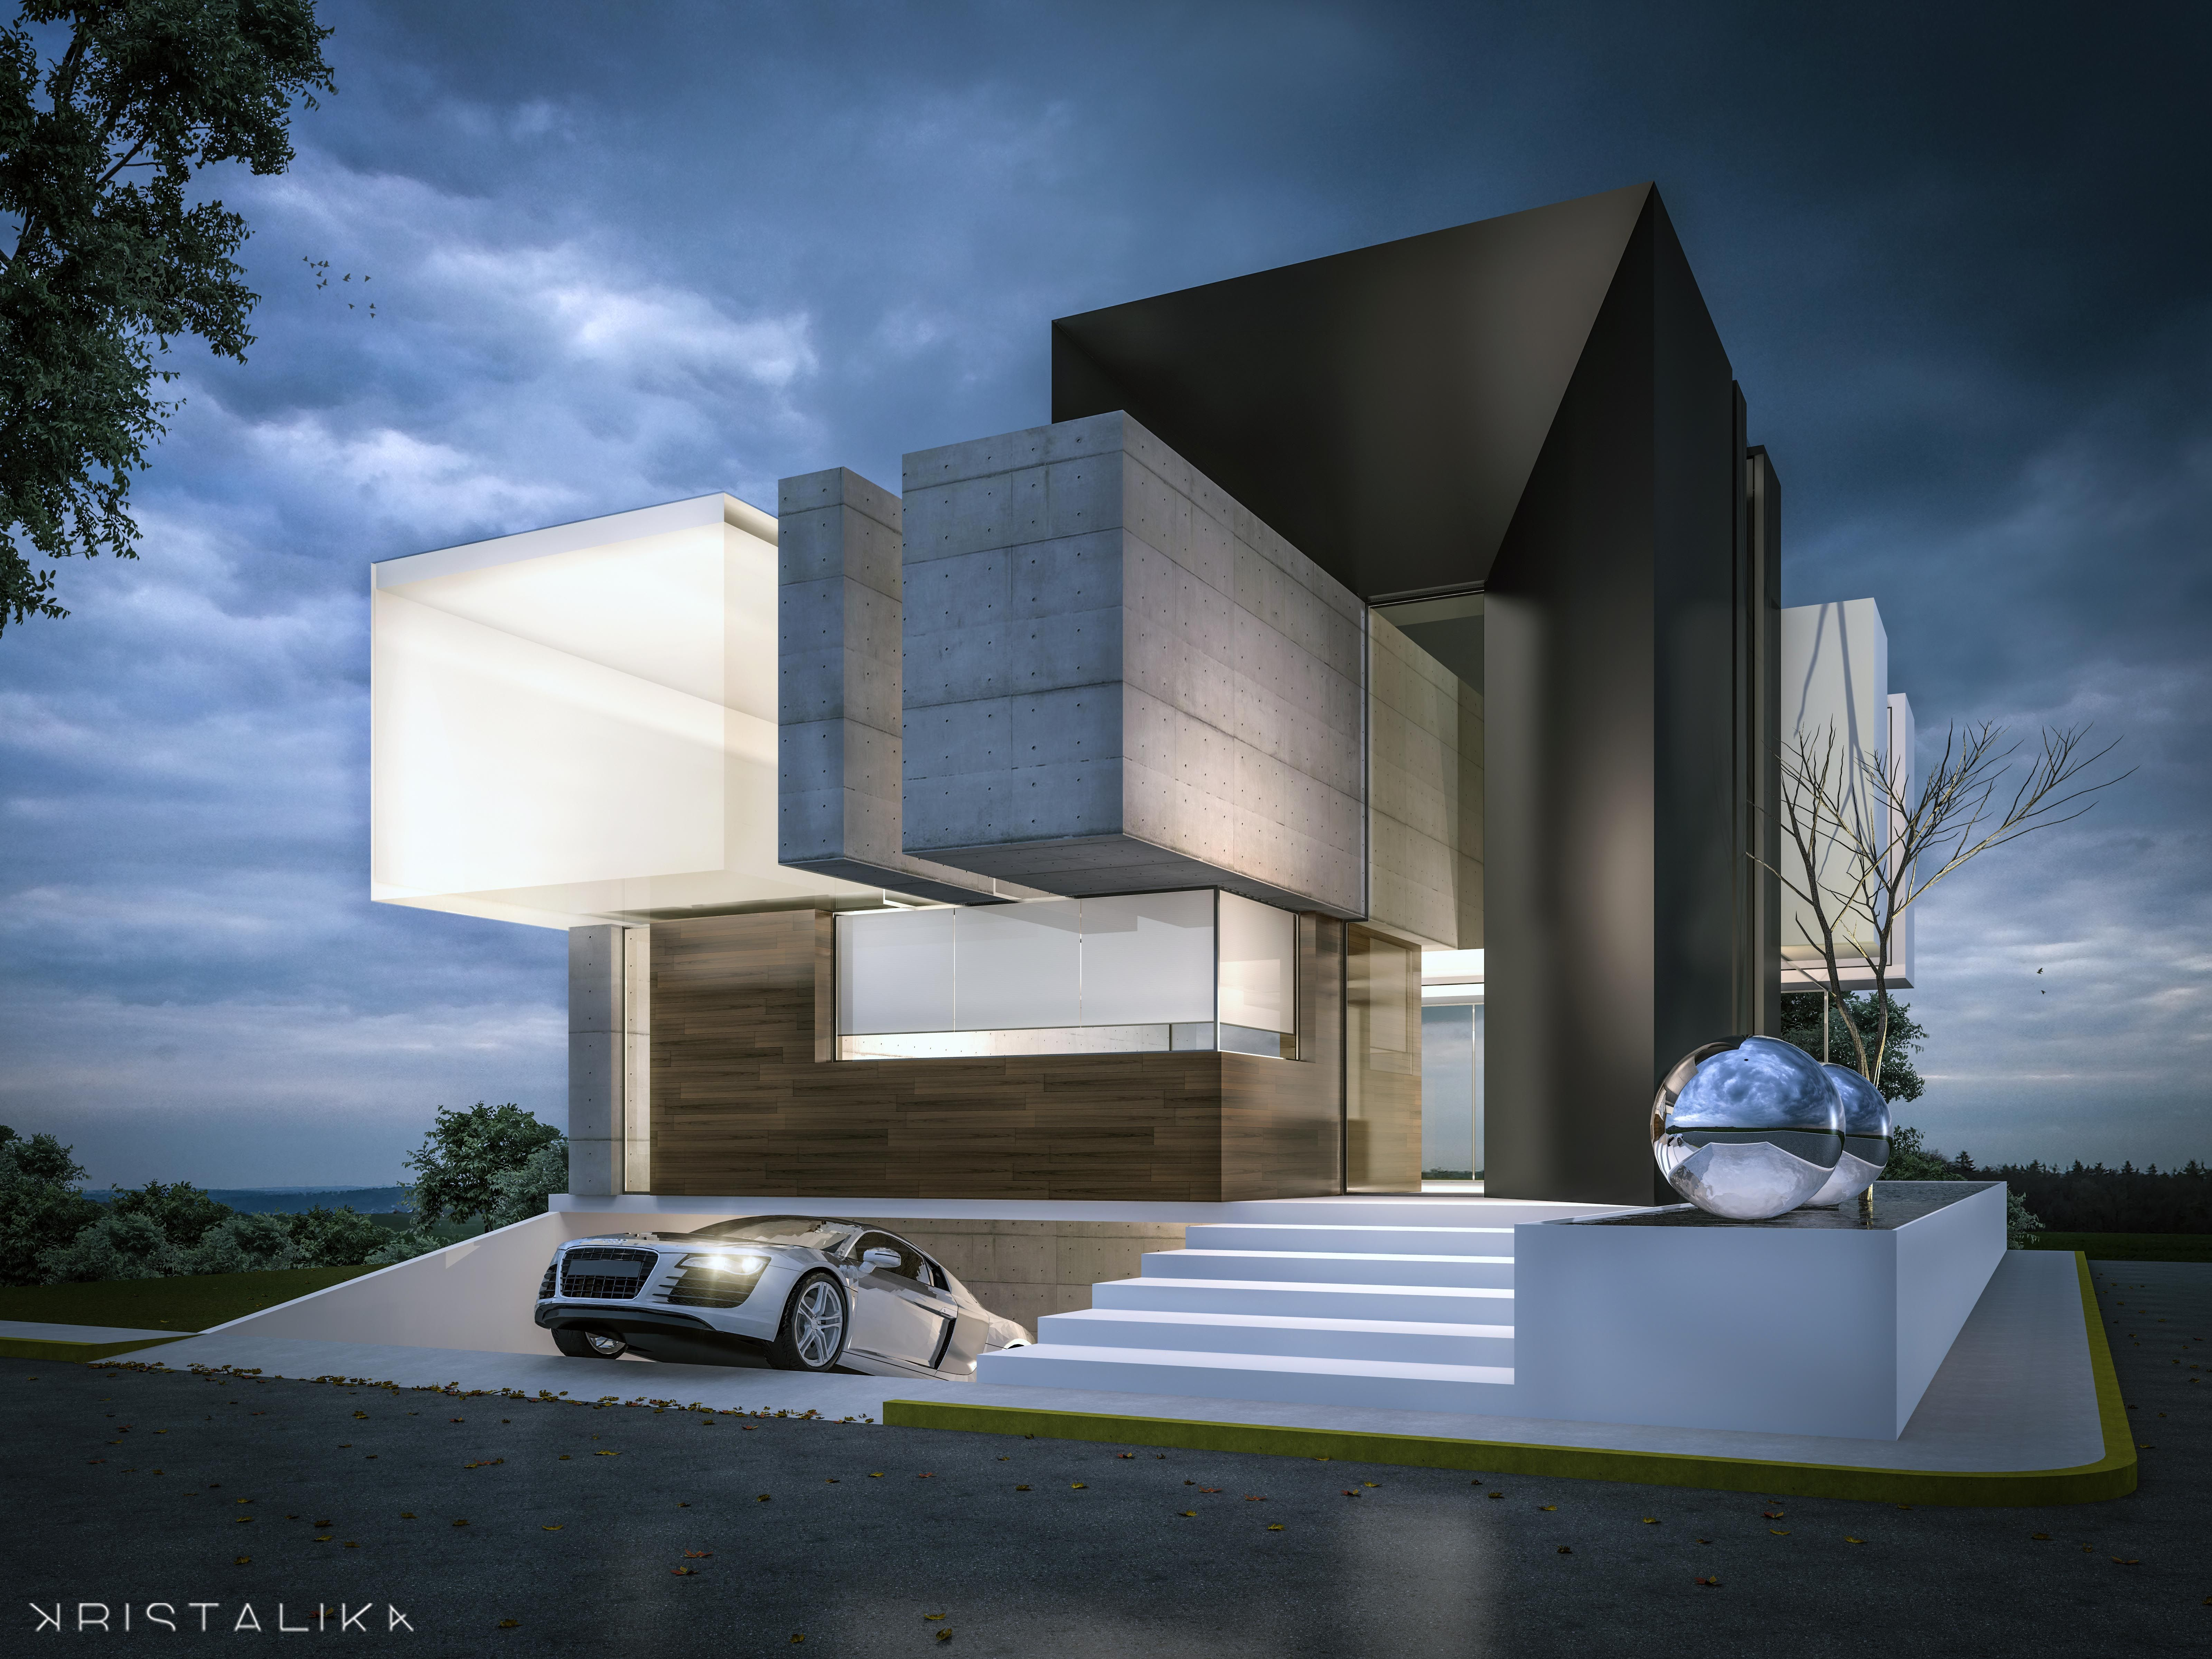 Pinterest falalalaland snapchatt joycenieves for Casas minimalistas modernas con cochera subterranea